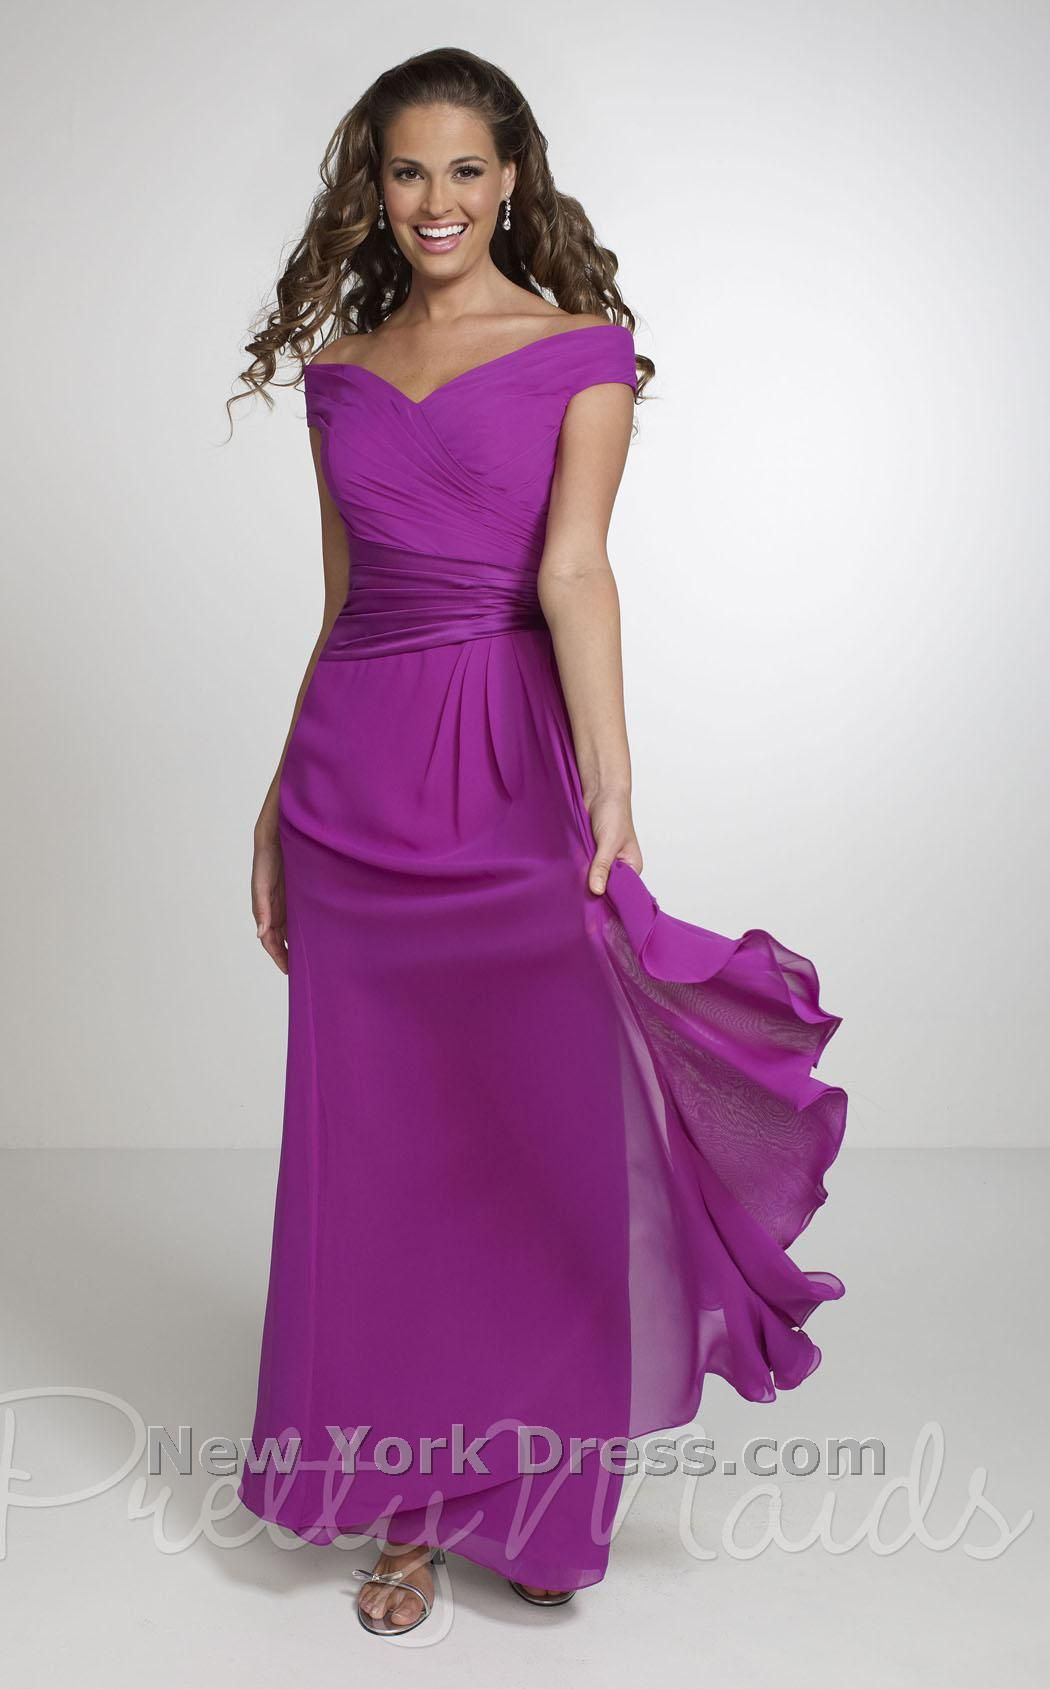 Pretty Maids Dress 22534 | Maids and Wedding